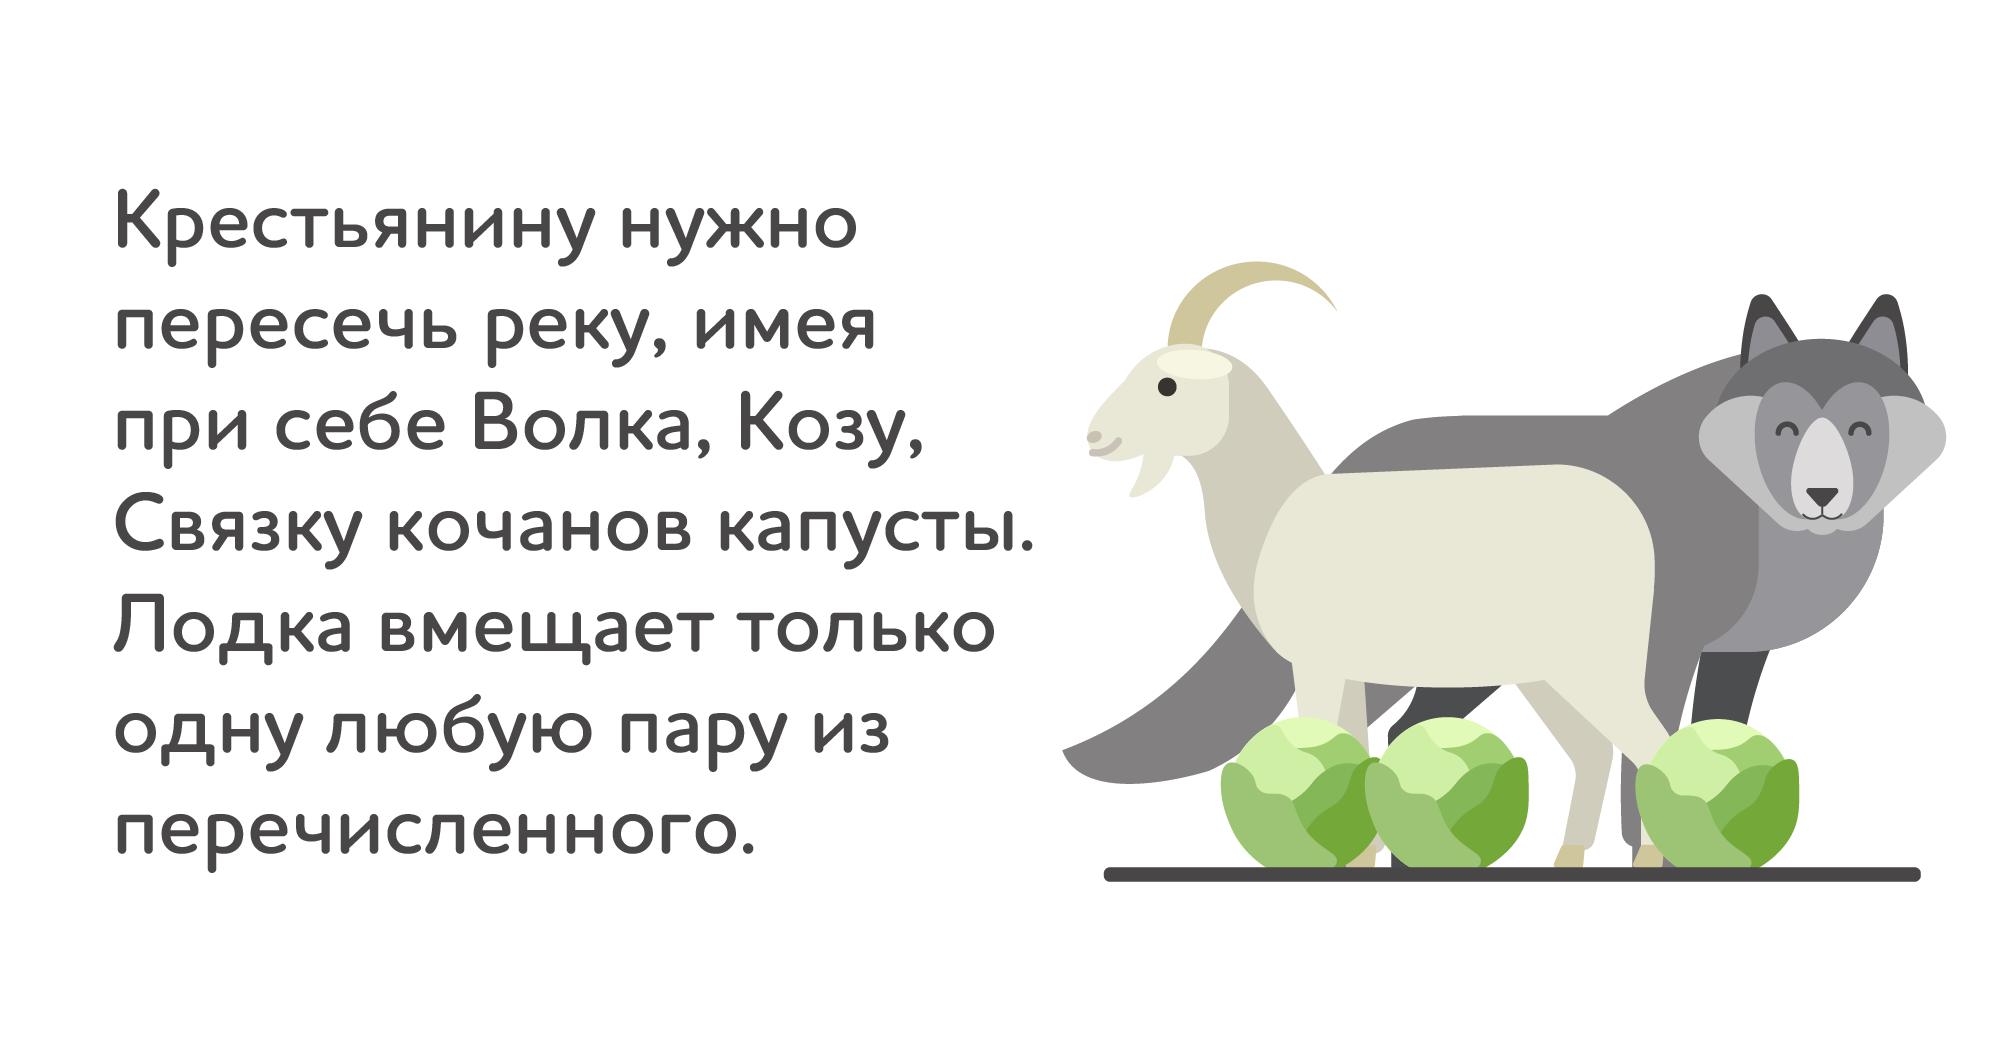 коза, волк и капуста — иллюстрация с условиями задачи о переправе